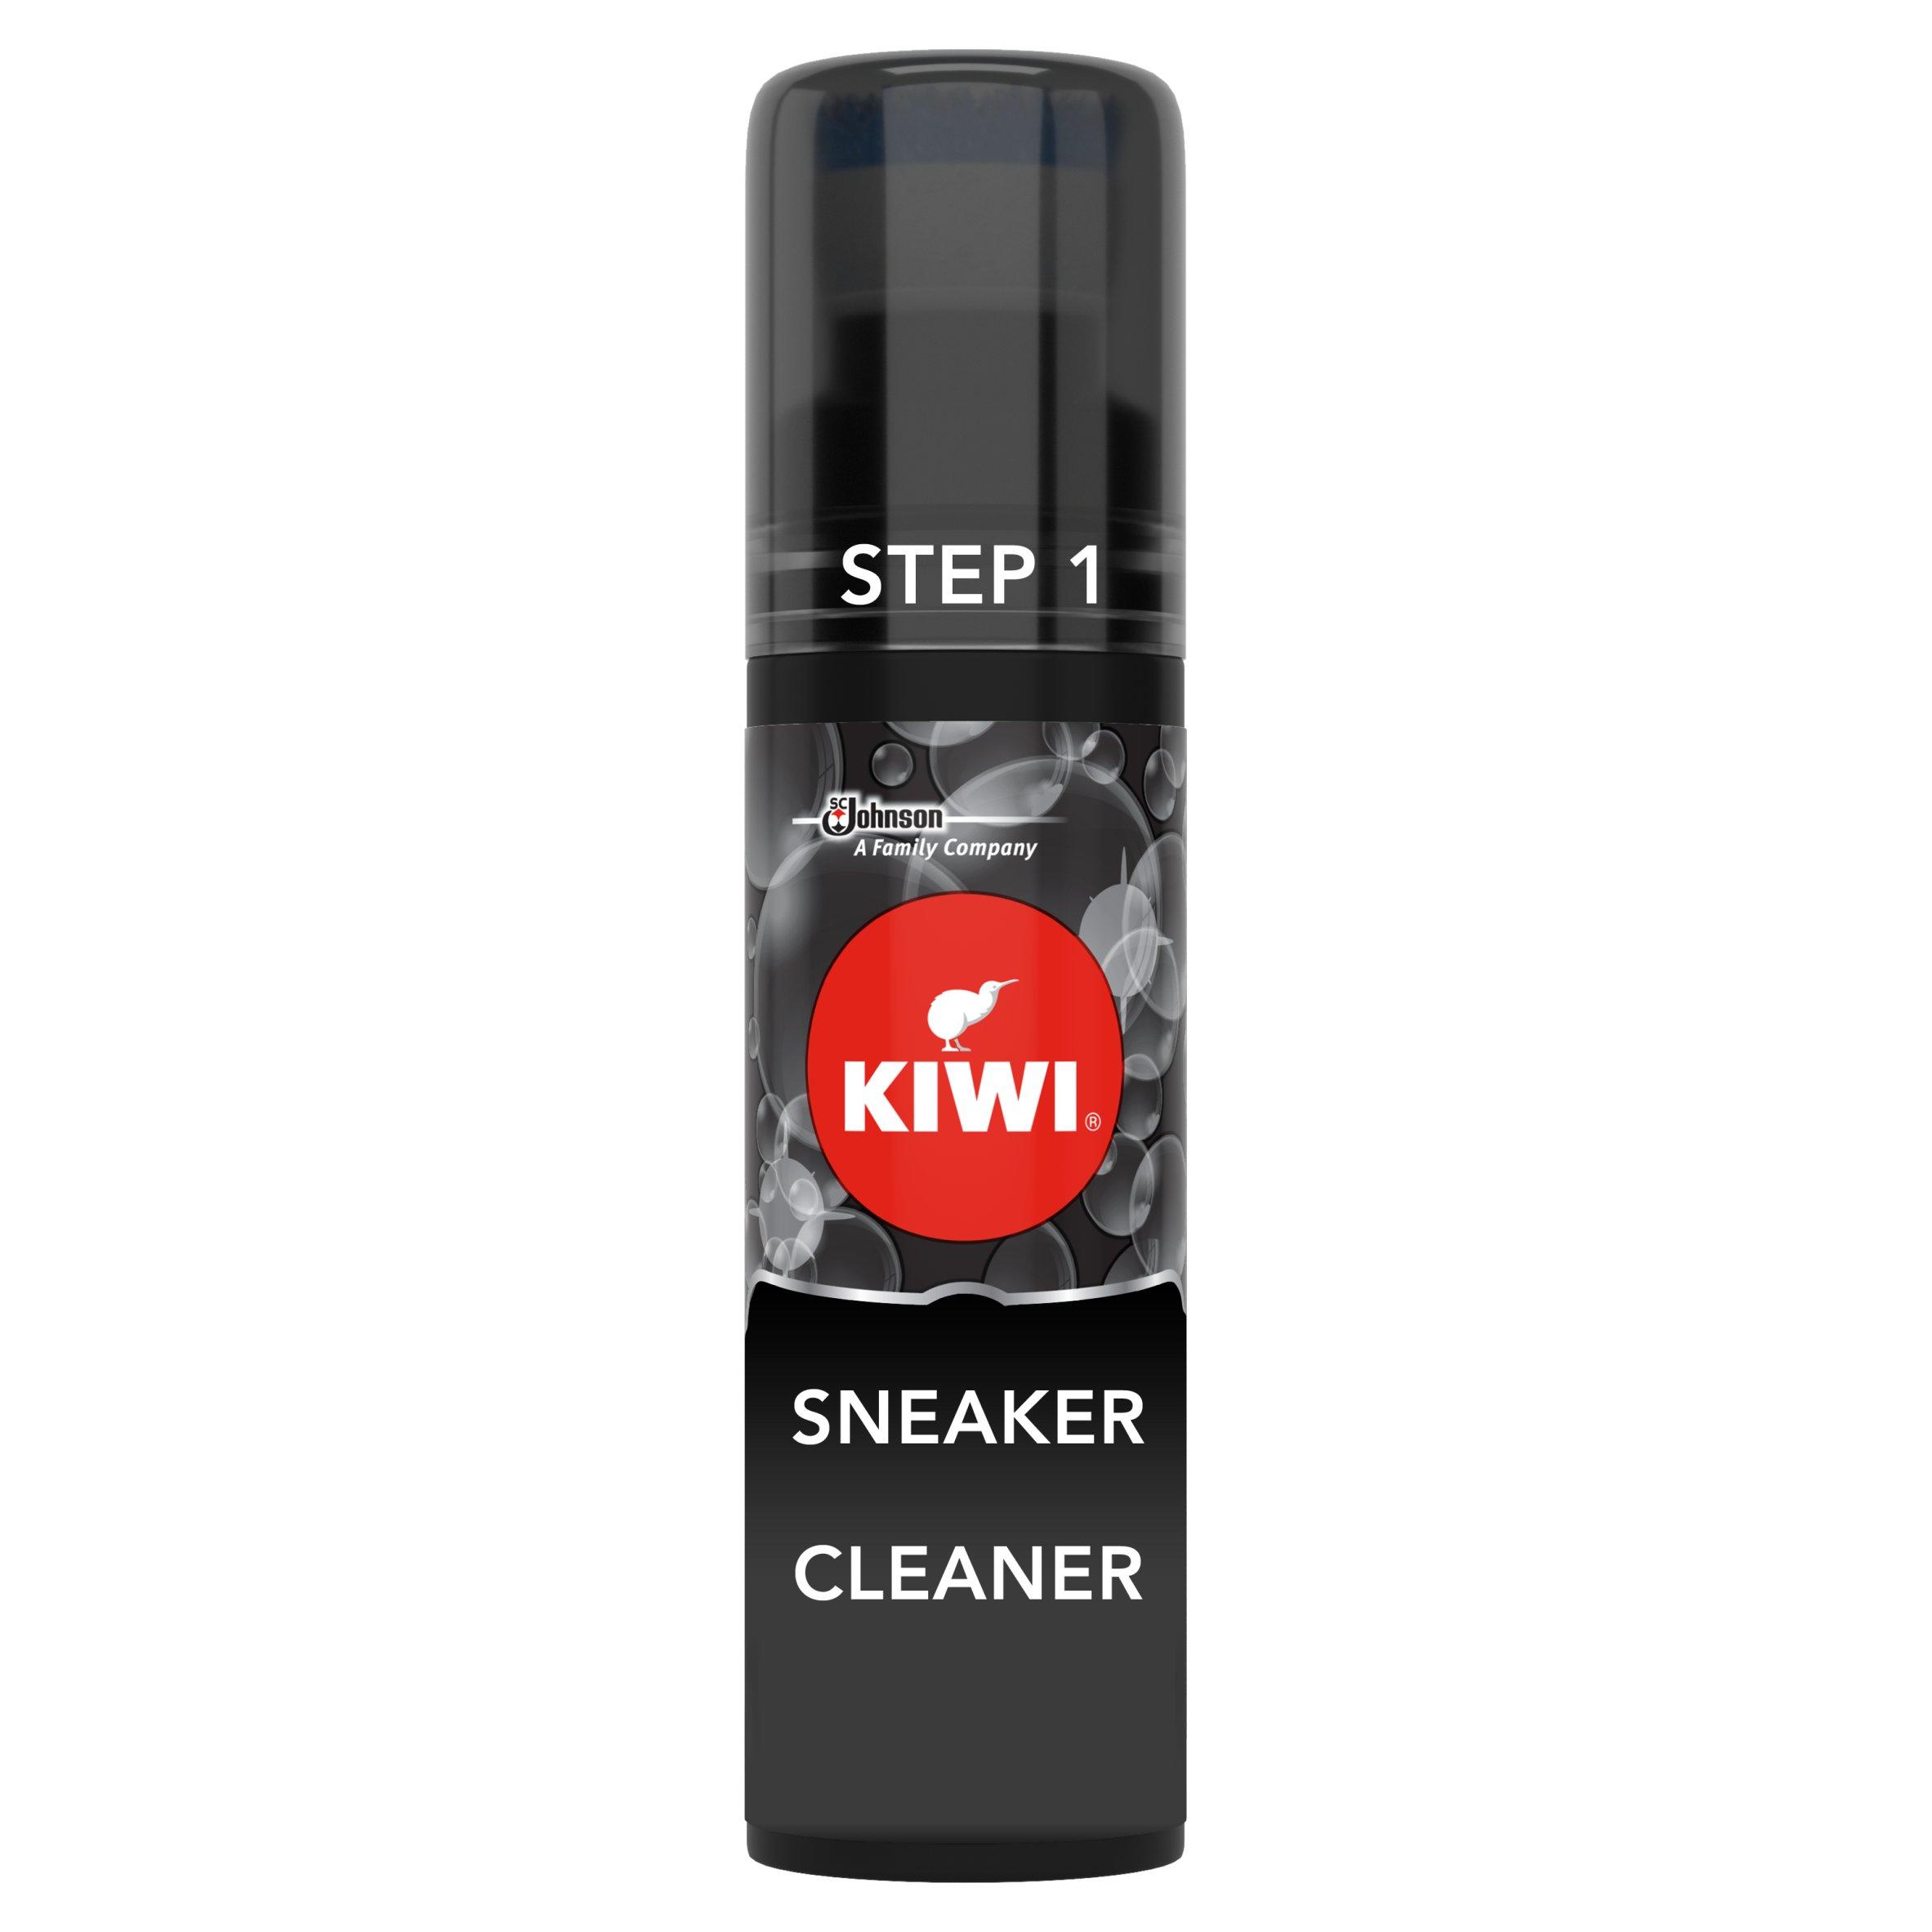 Kiwi Sneaker Cleaner 75Ml - Tesco Groceries